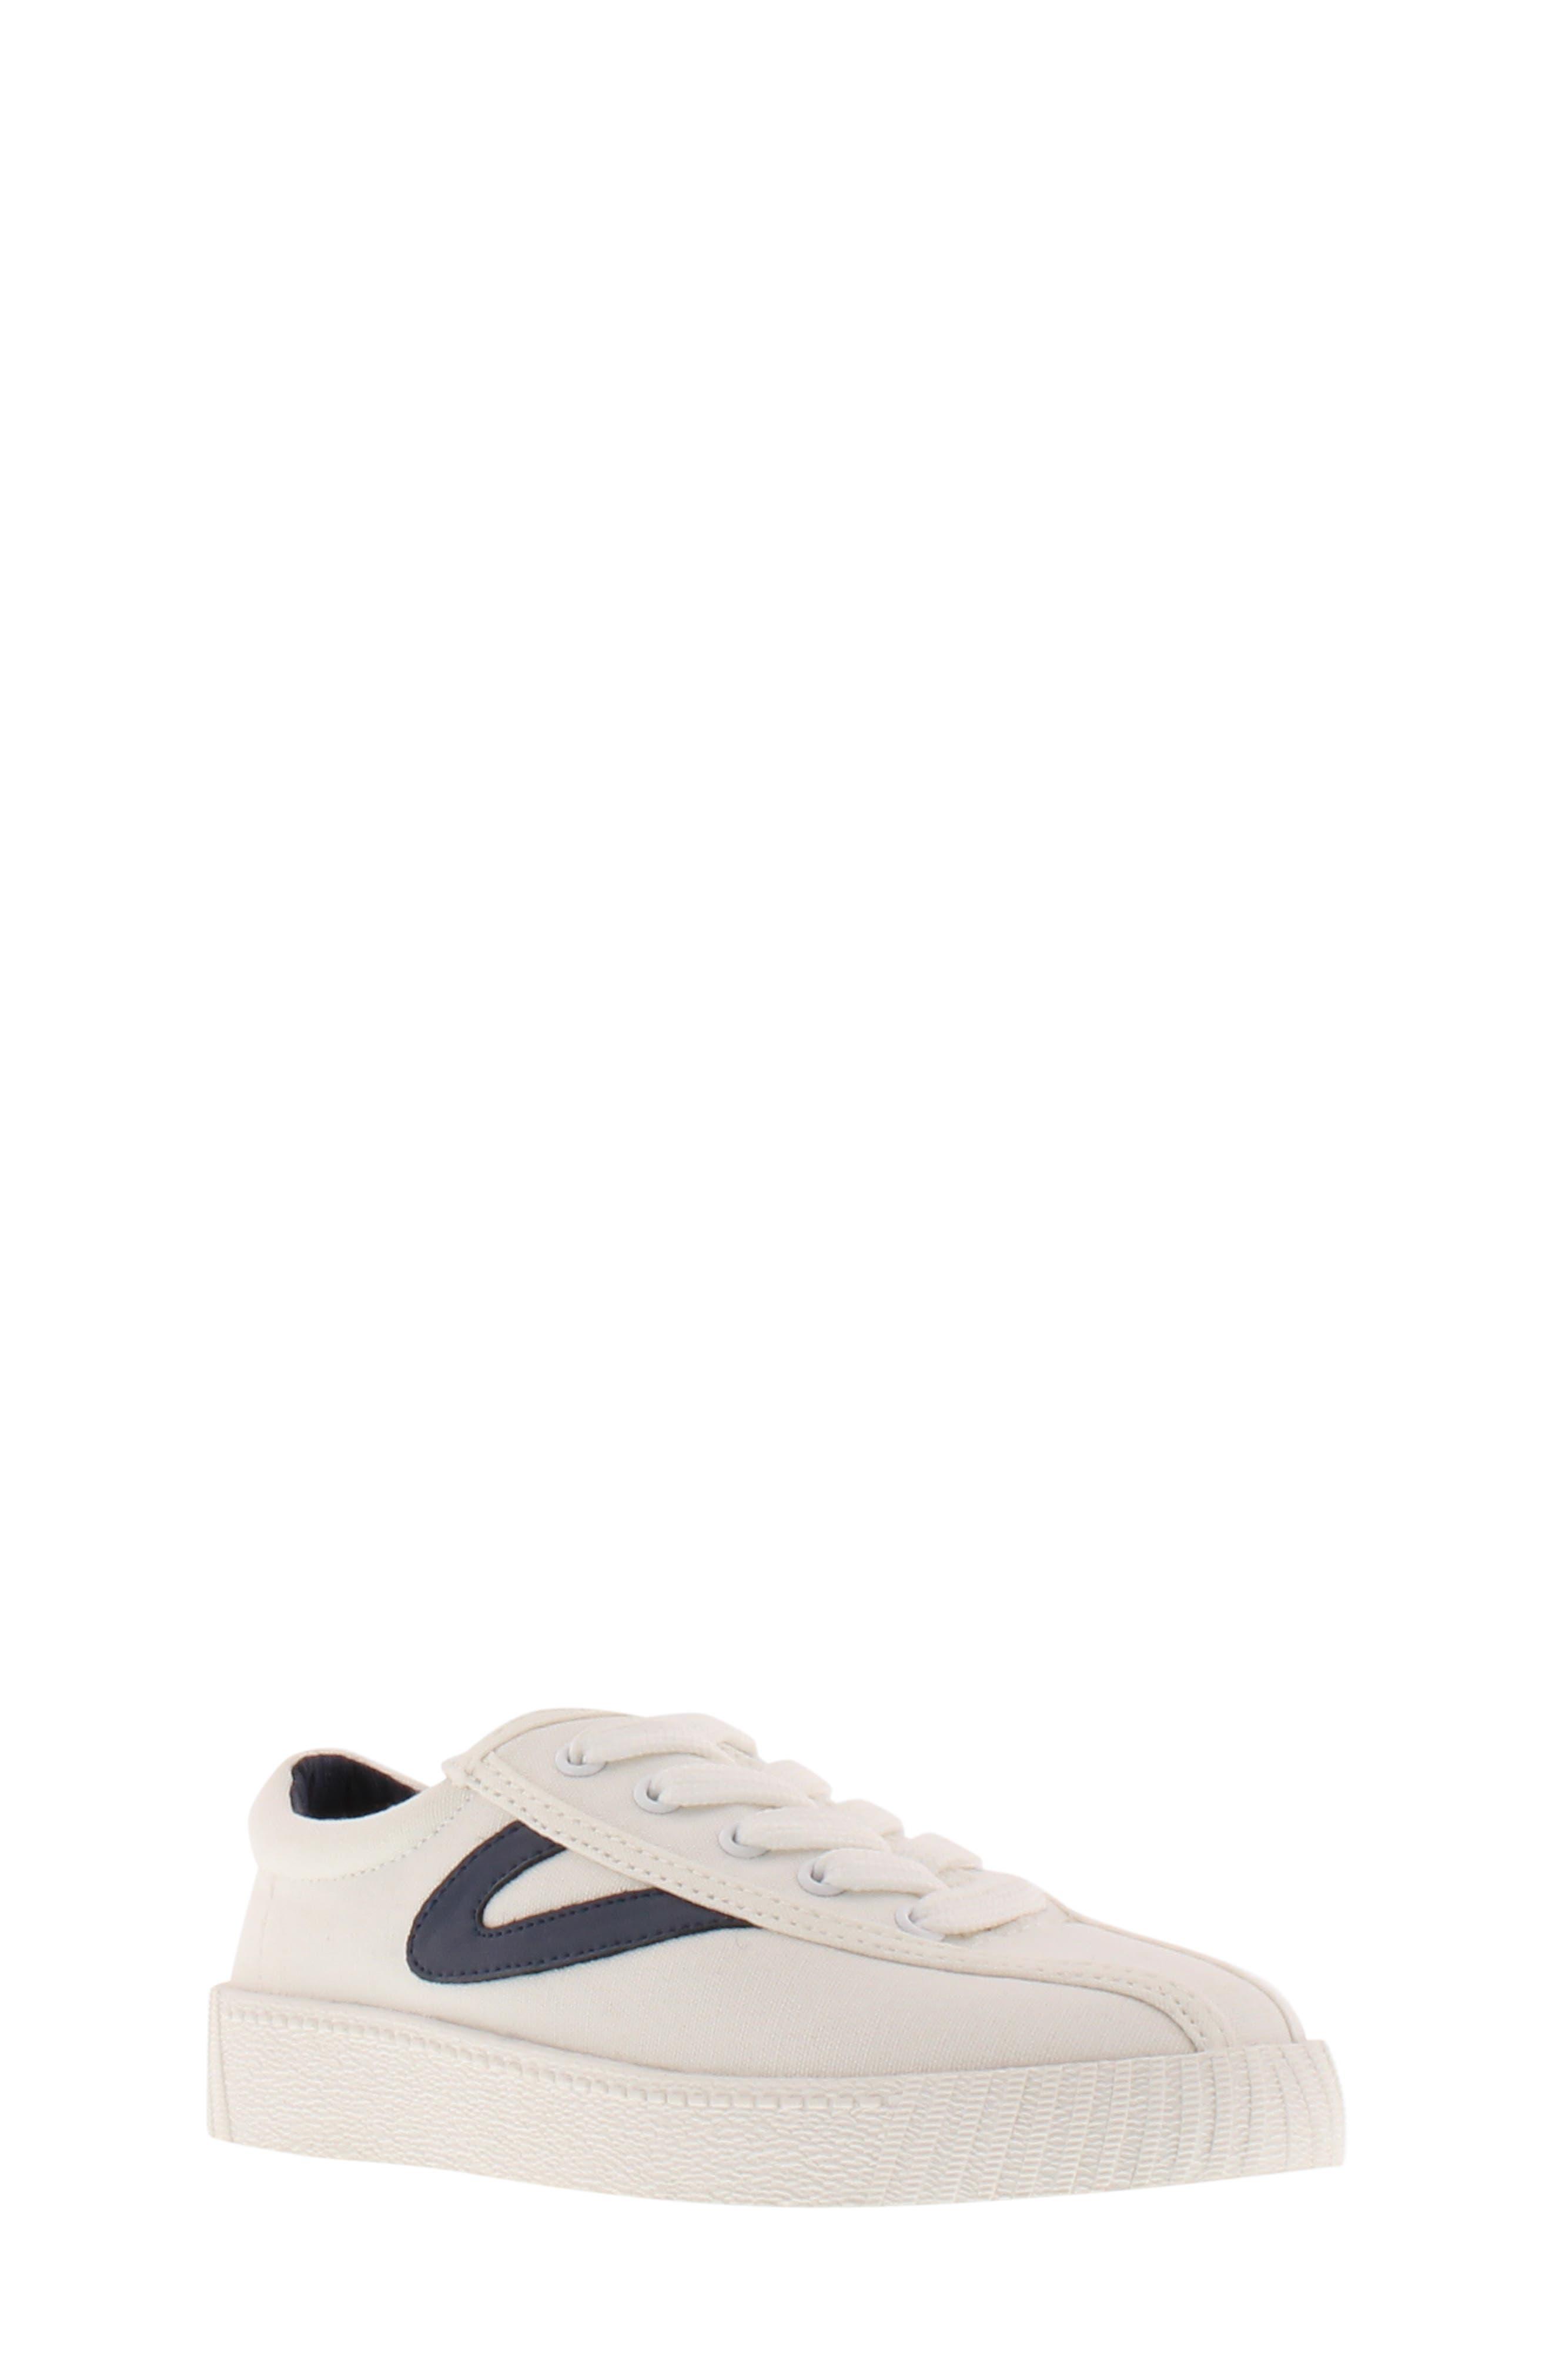 Nylite Plus Sneaker,                         Main,                         color, WHITE/ NIGHT